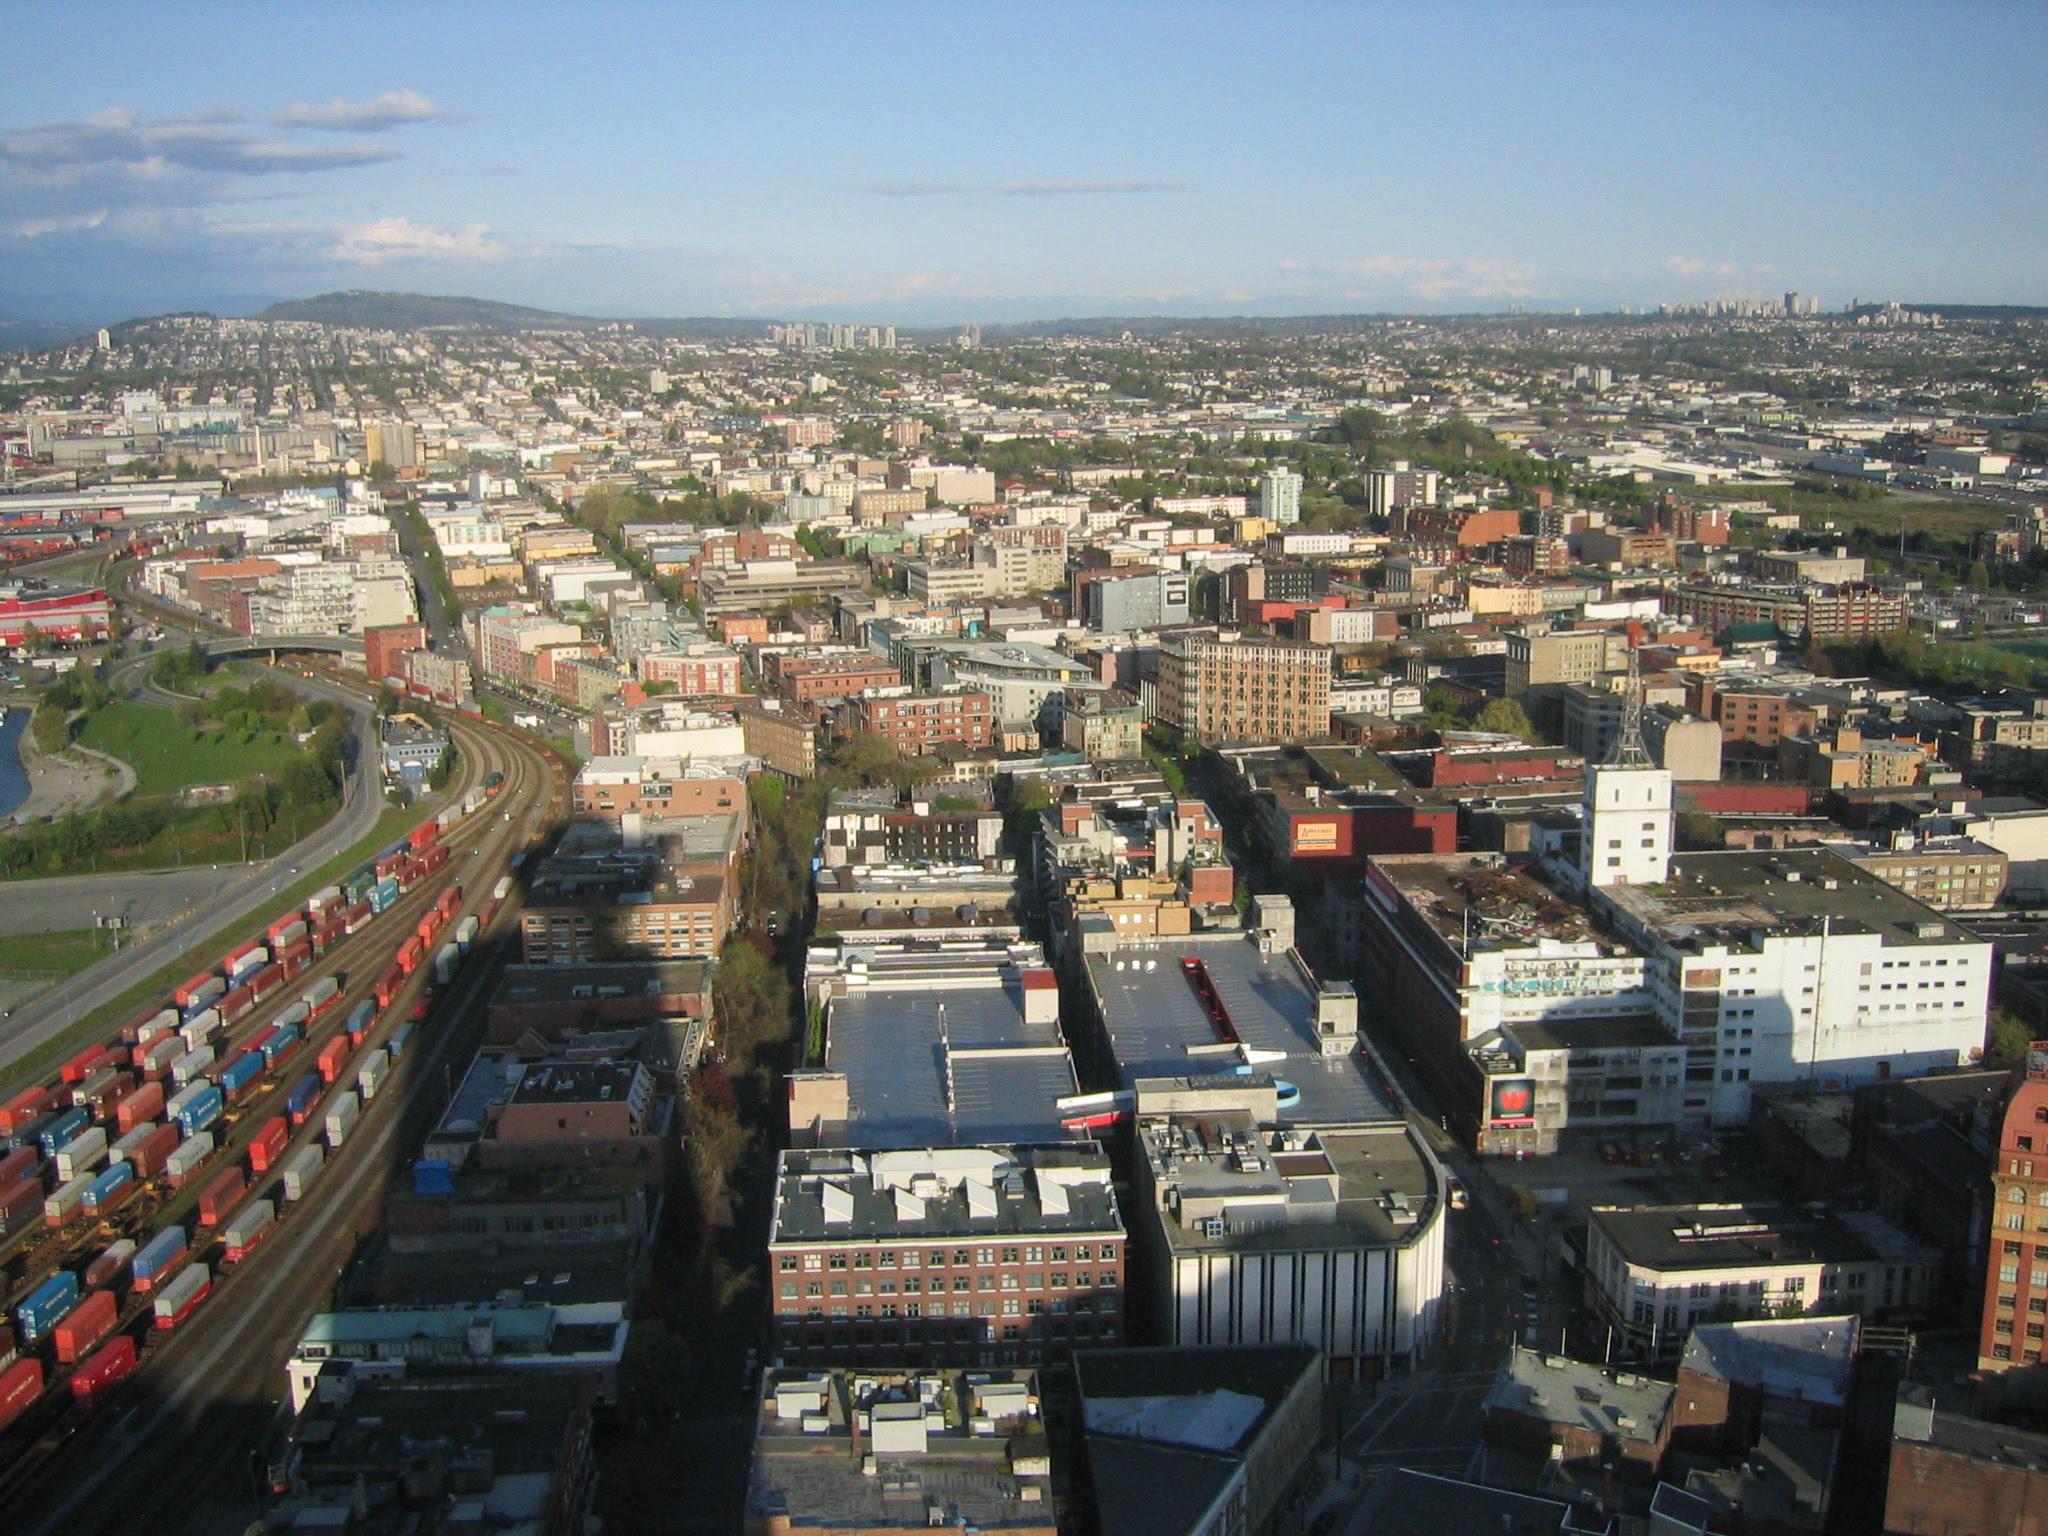 Aerial view of Gastown